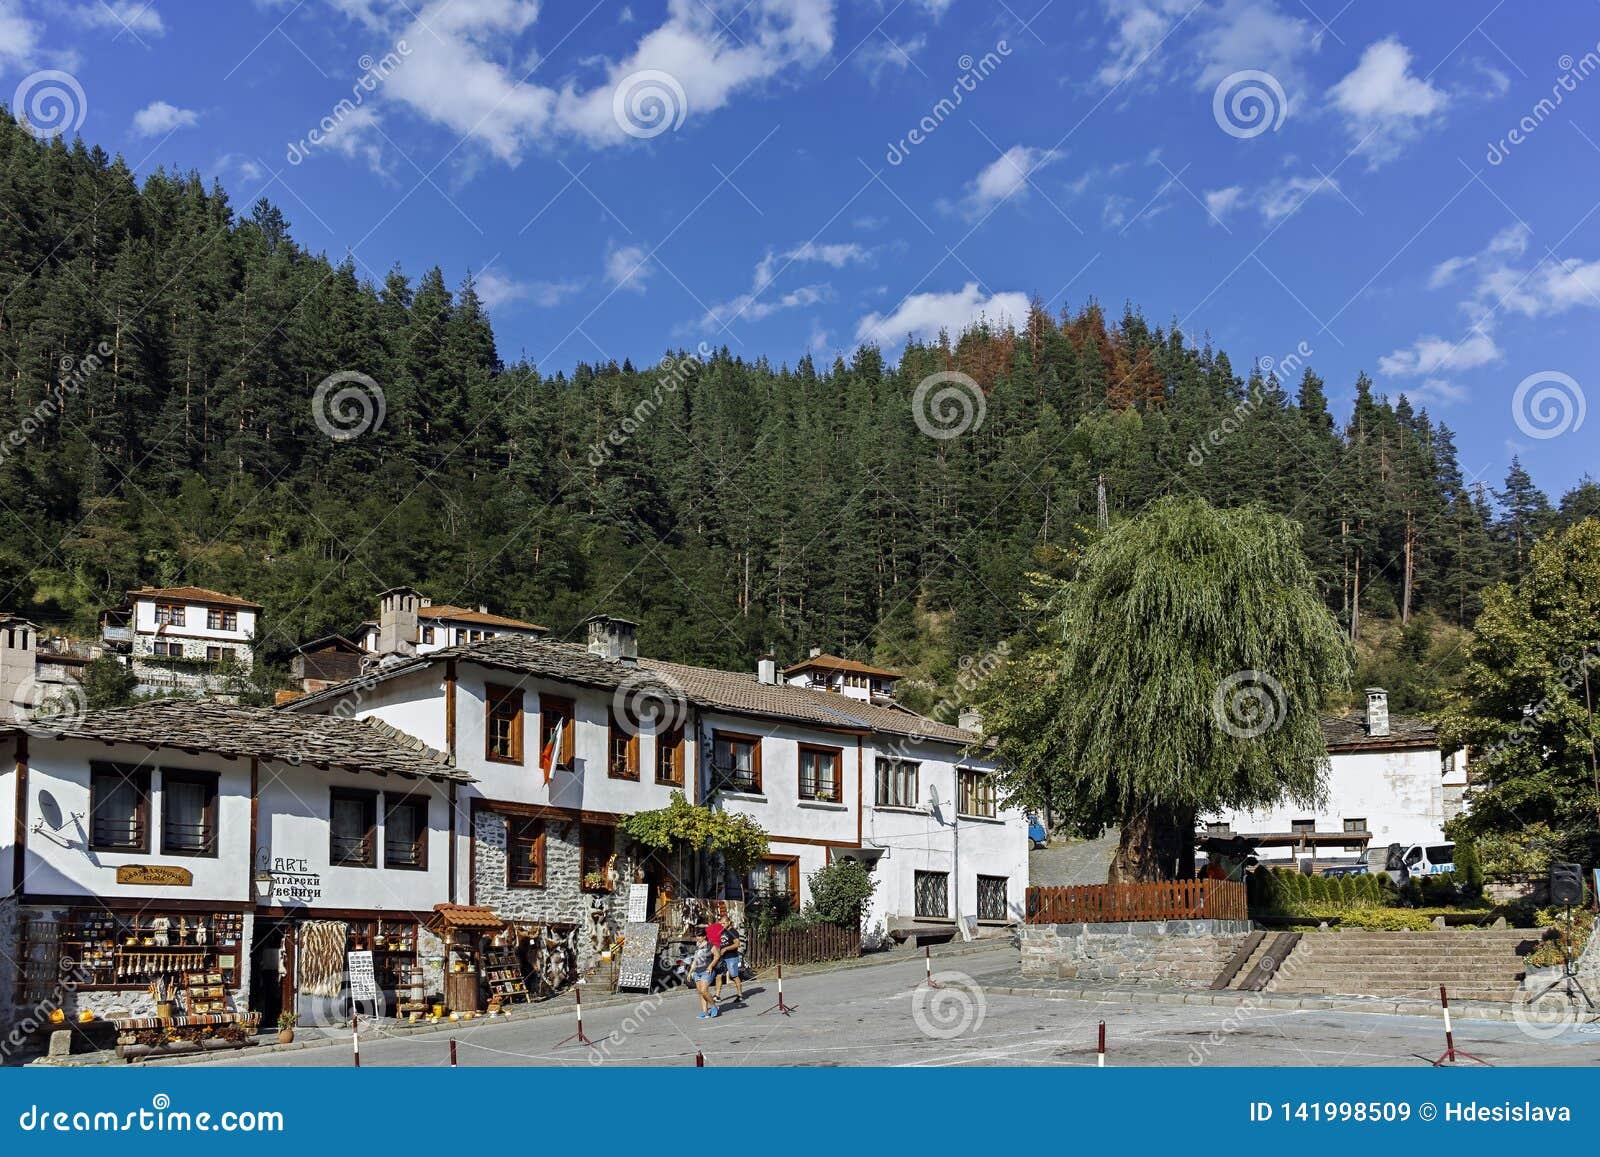 Vecchie case e vie in città storica di Shiroka Laka, Bulgaria